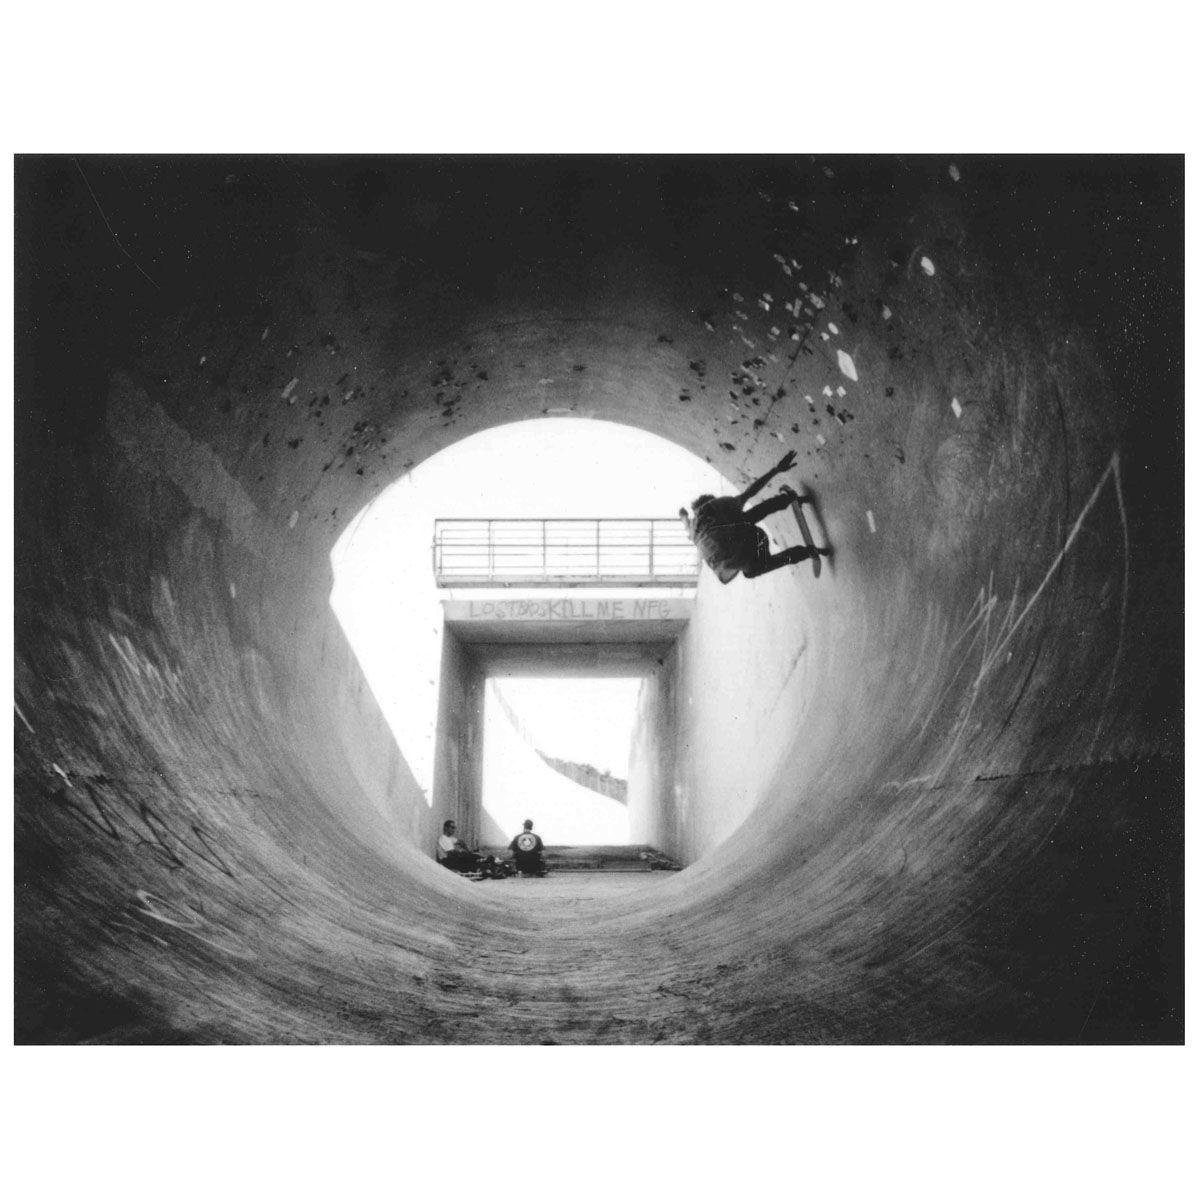 Through the tunnel...